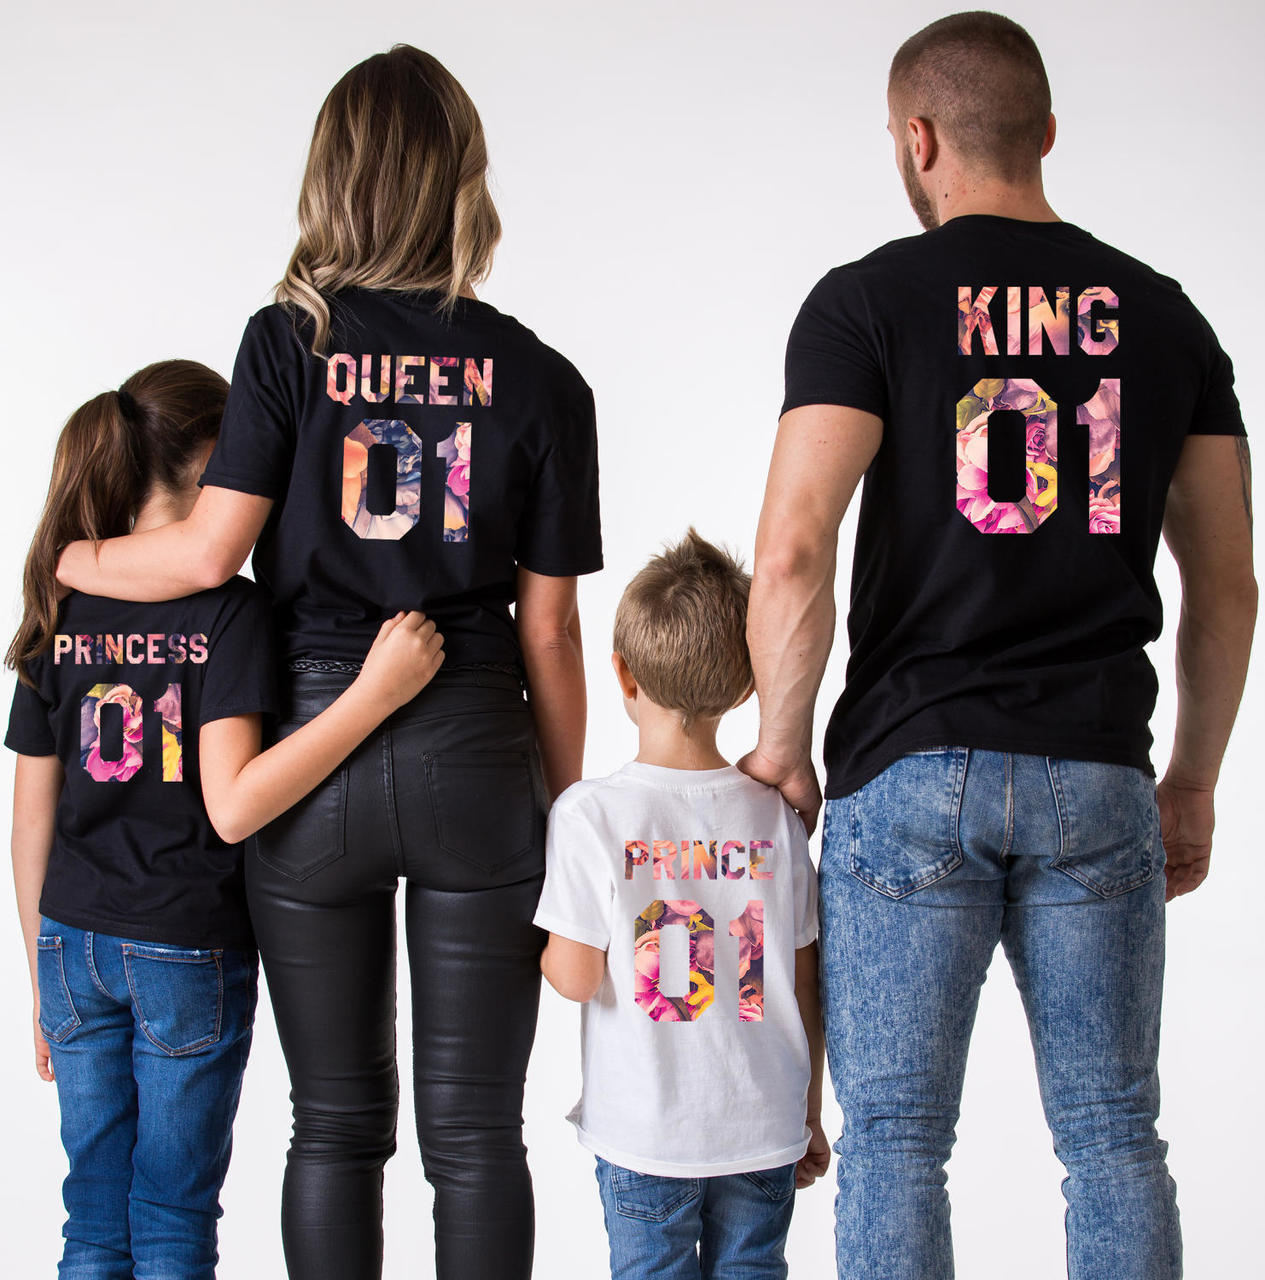 Queen 01 and Princess 01 Ensemble DE Tee Shirt et Body Marine King 01